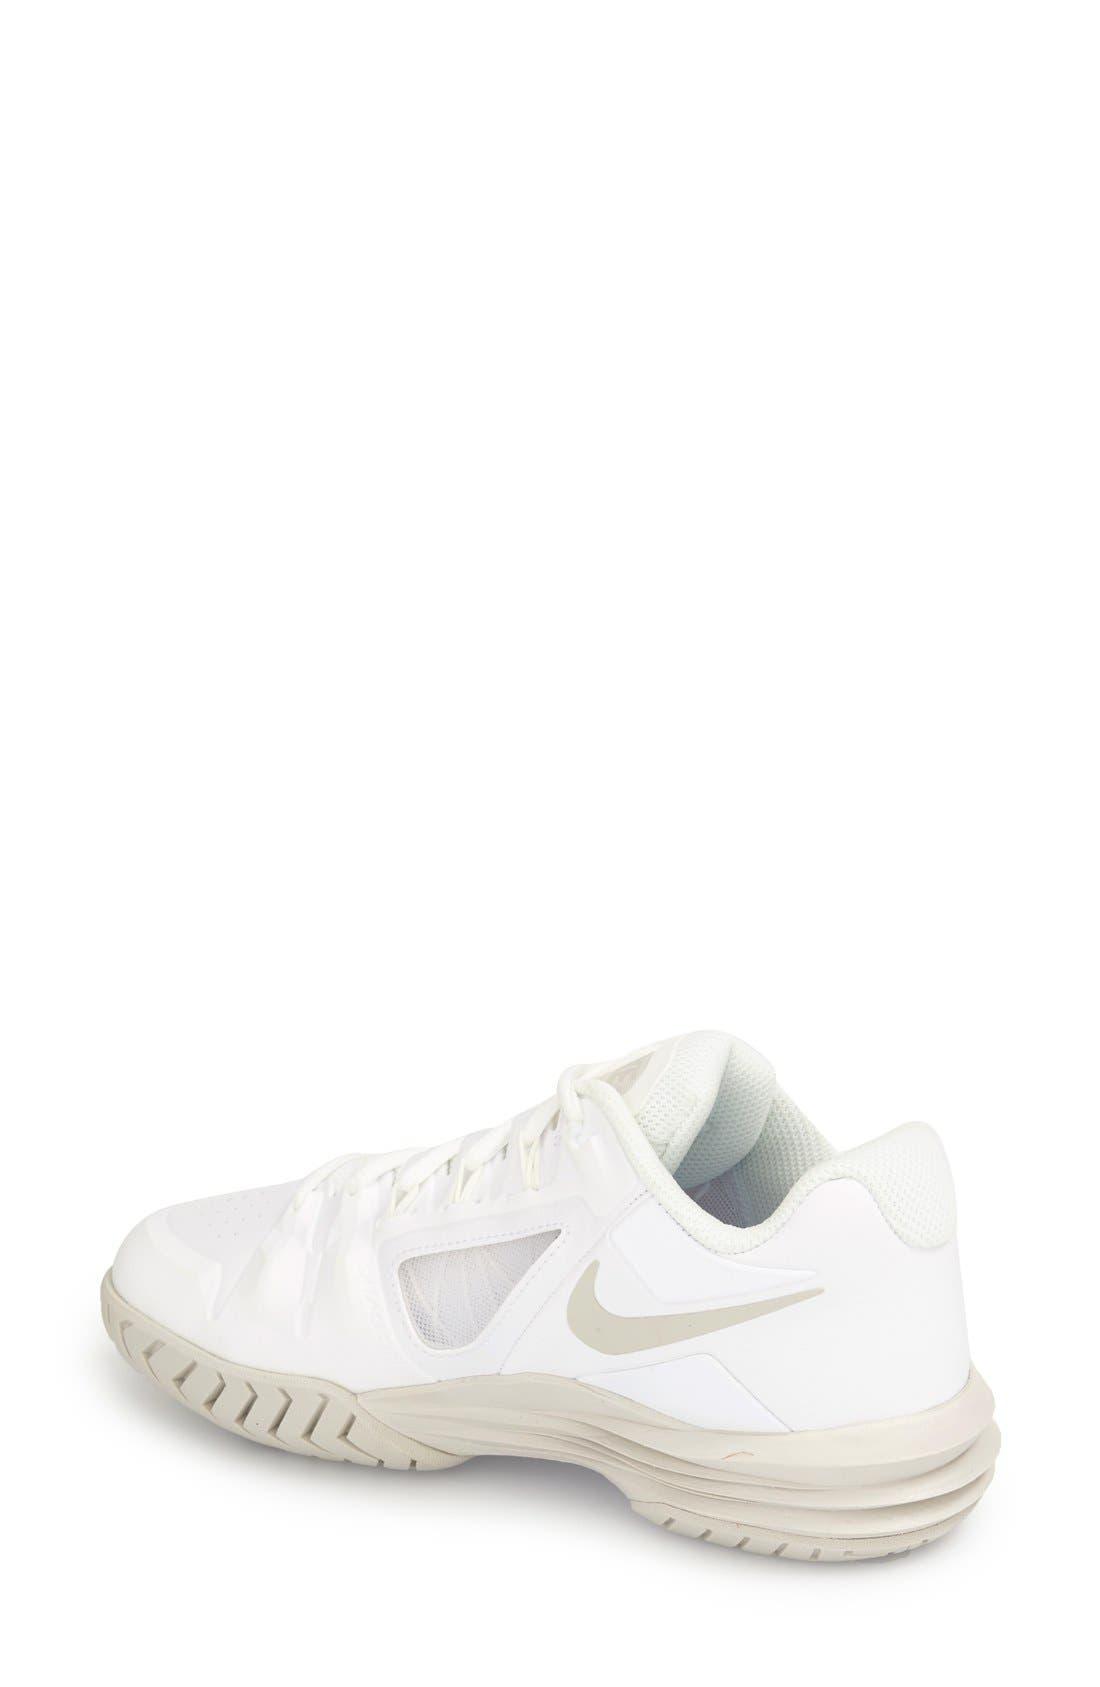 Alternate Image 2  - Nike 'Lunar Ballistec 1.5' Tennis Shoe (Women)